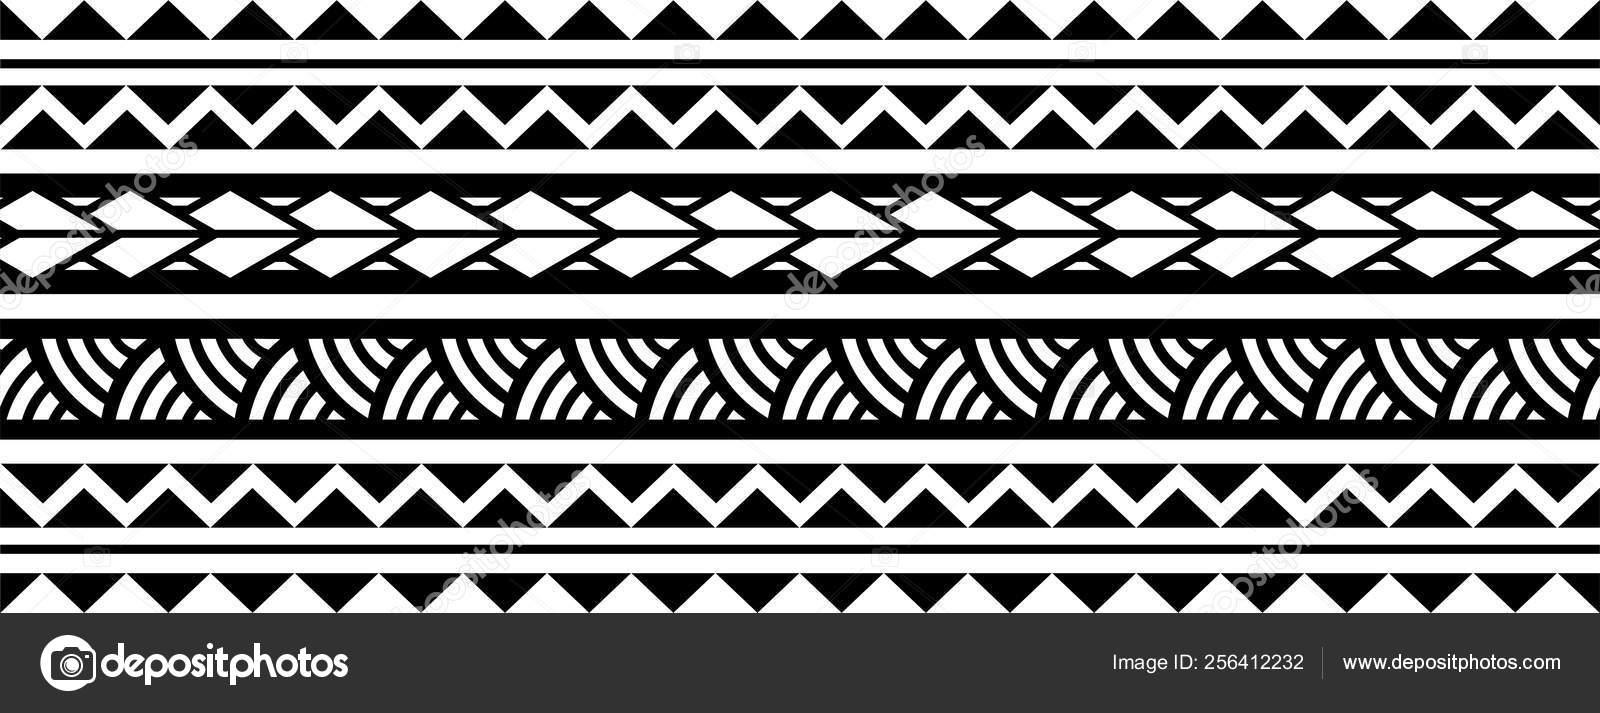 Tribal Leg Band Tattoo Designs